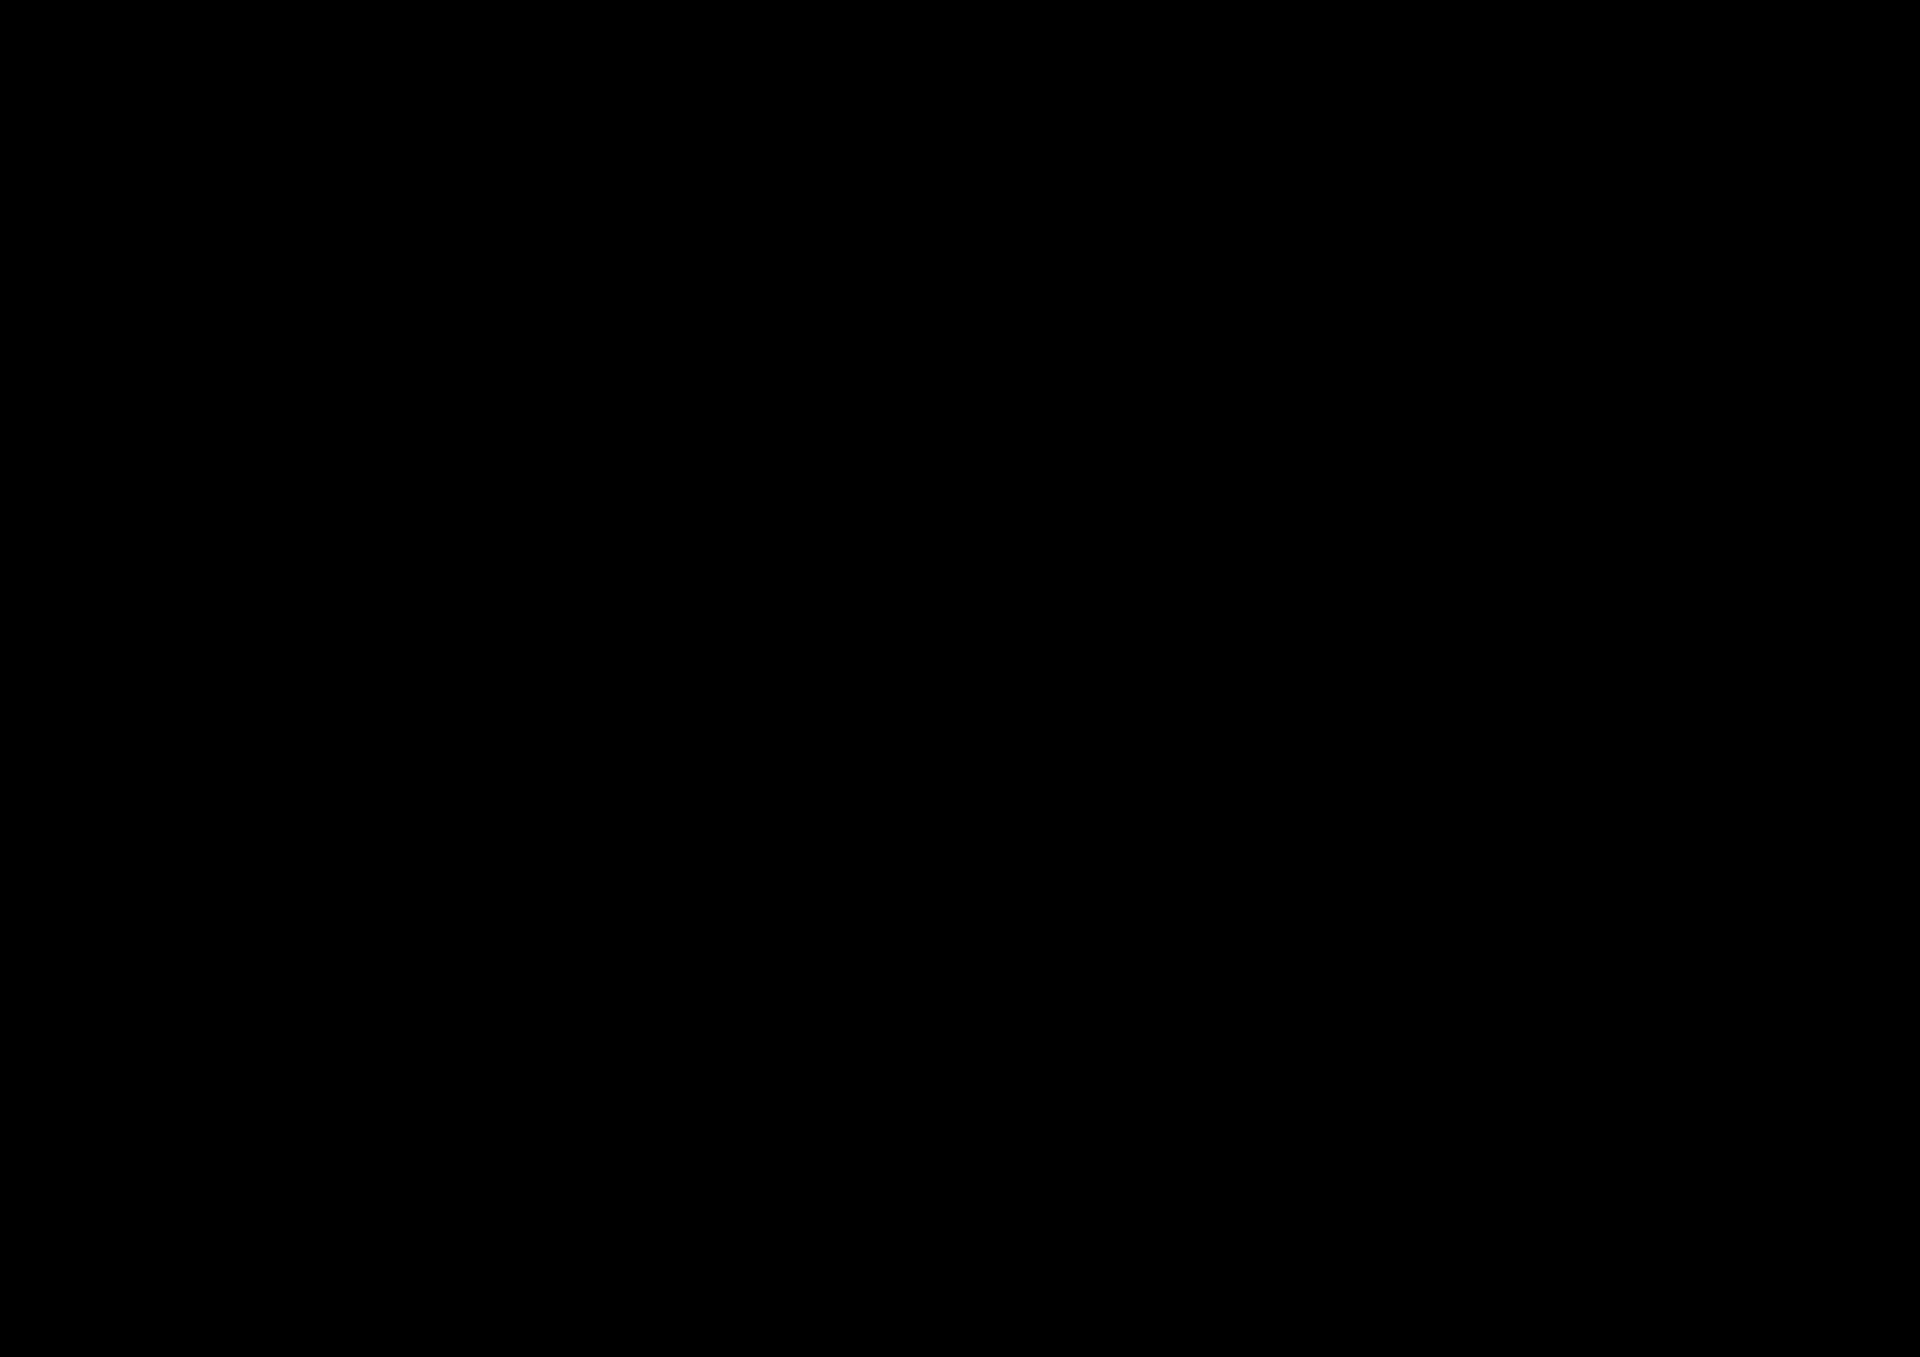 Florianifeier